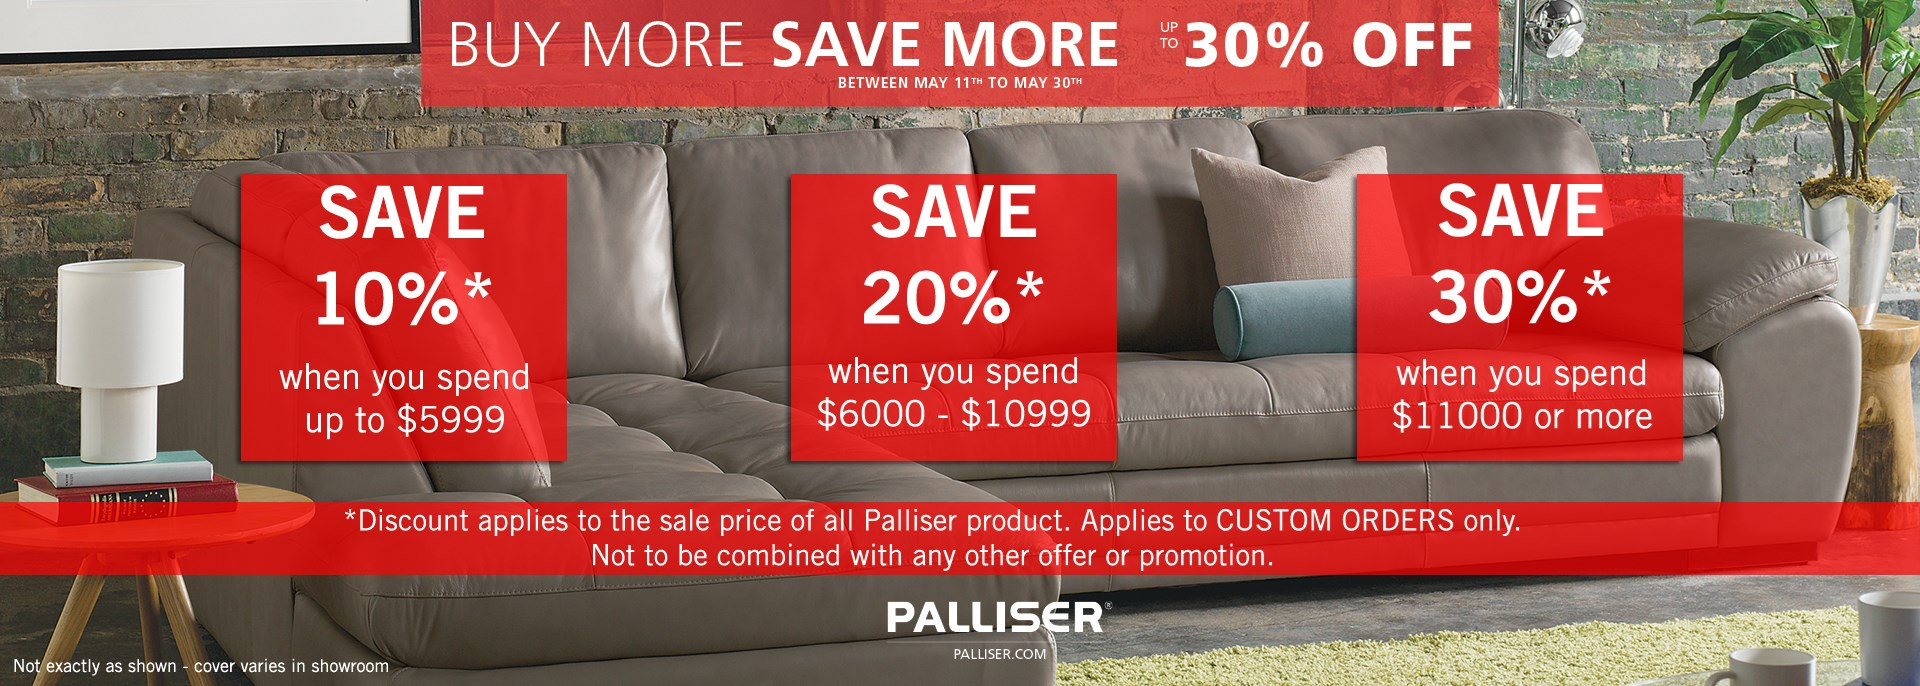 Palliser Buy More Save More Event